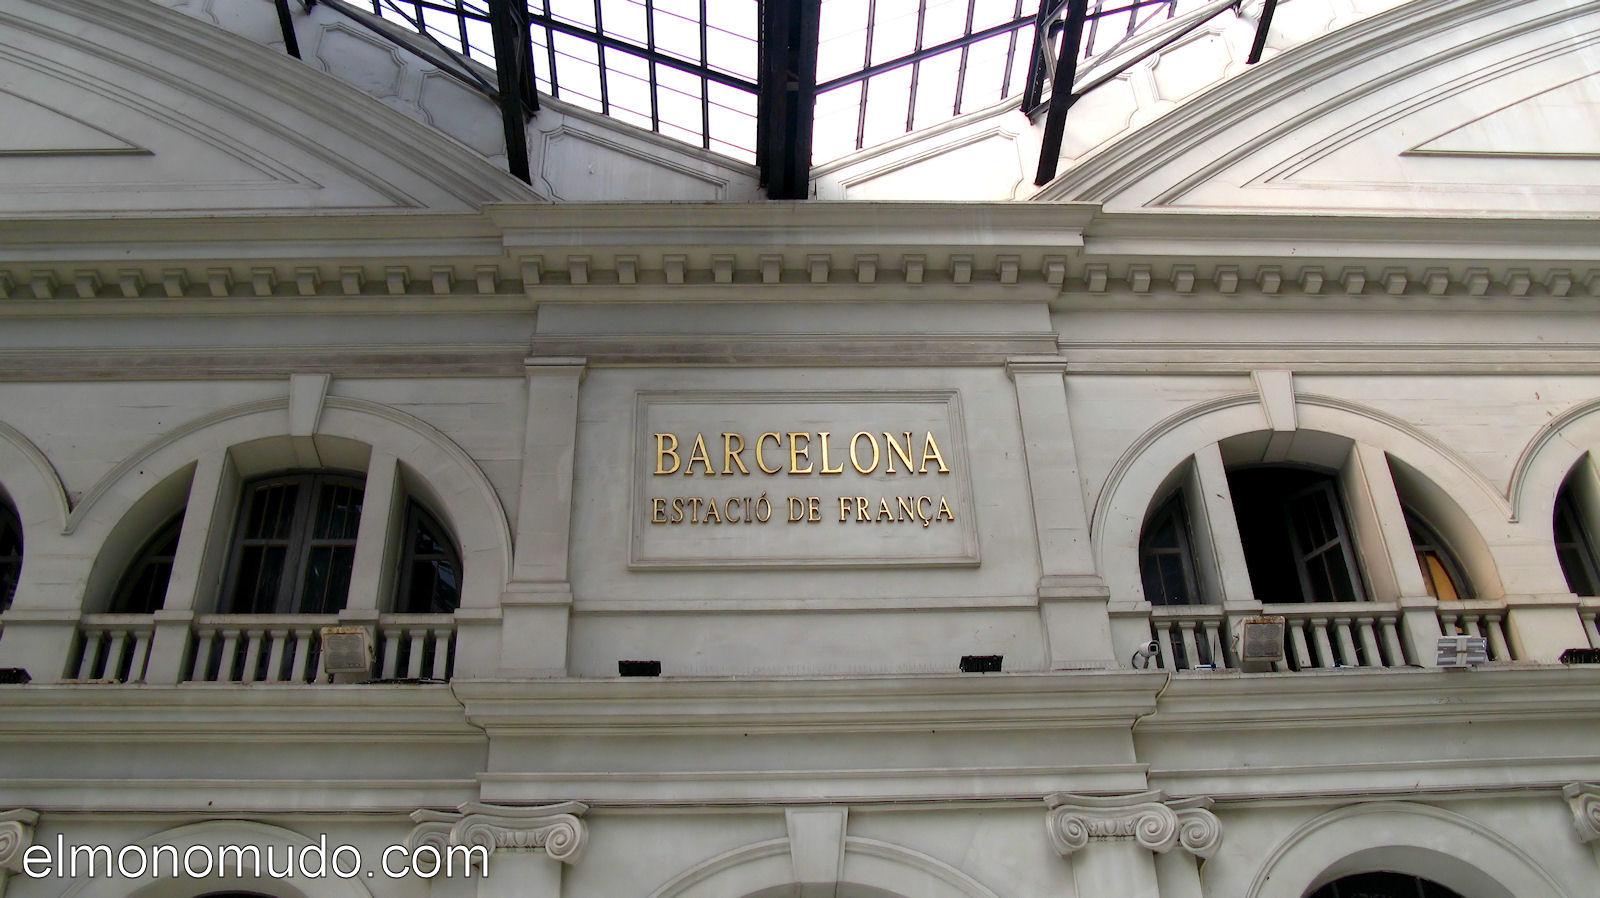 estacion_de_francia_barcelona_2010_11